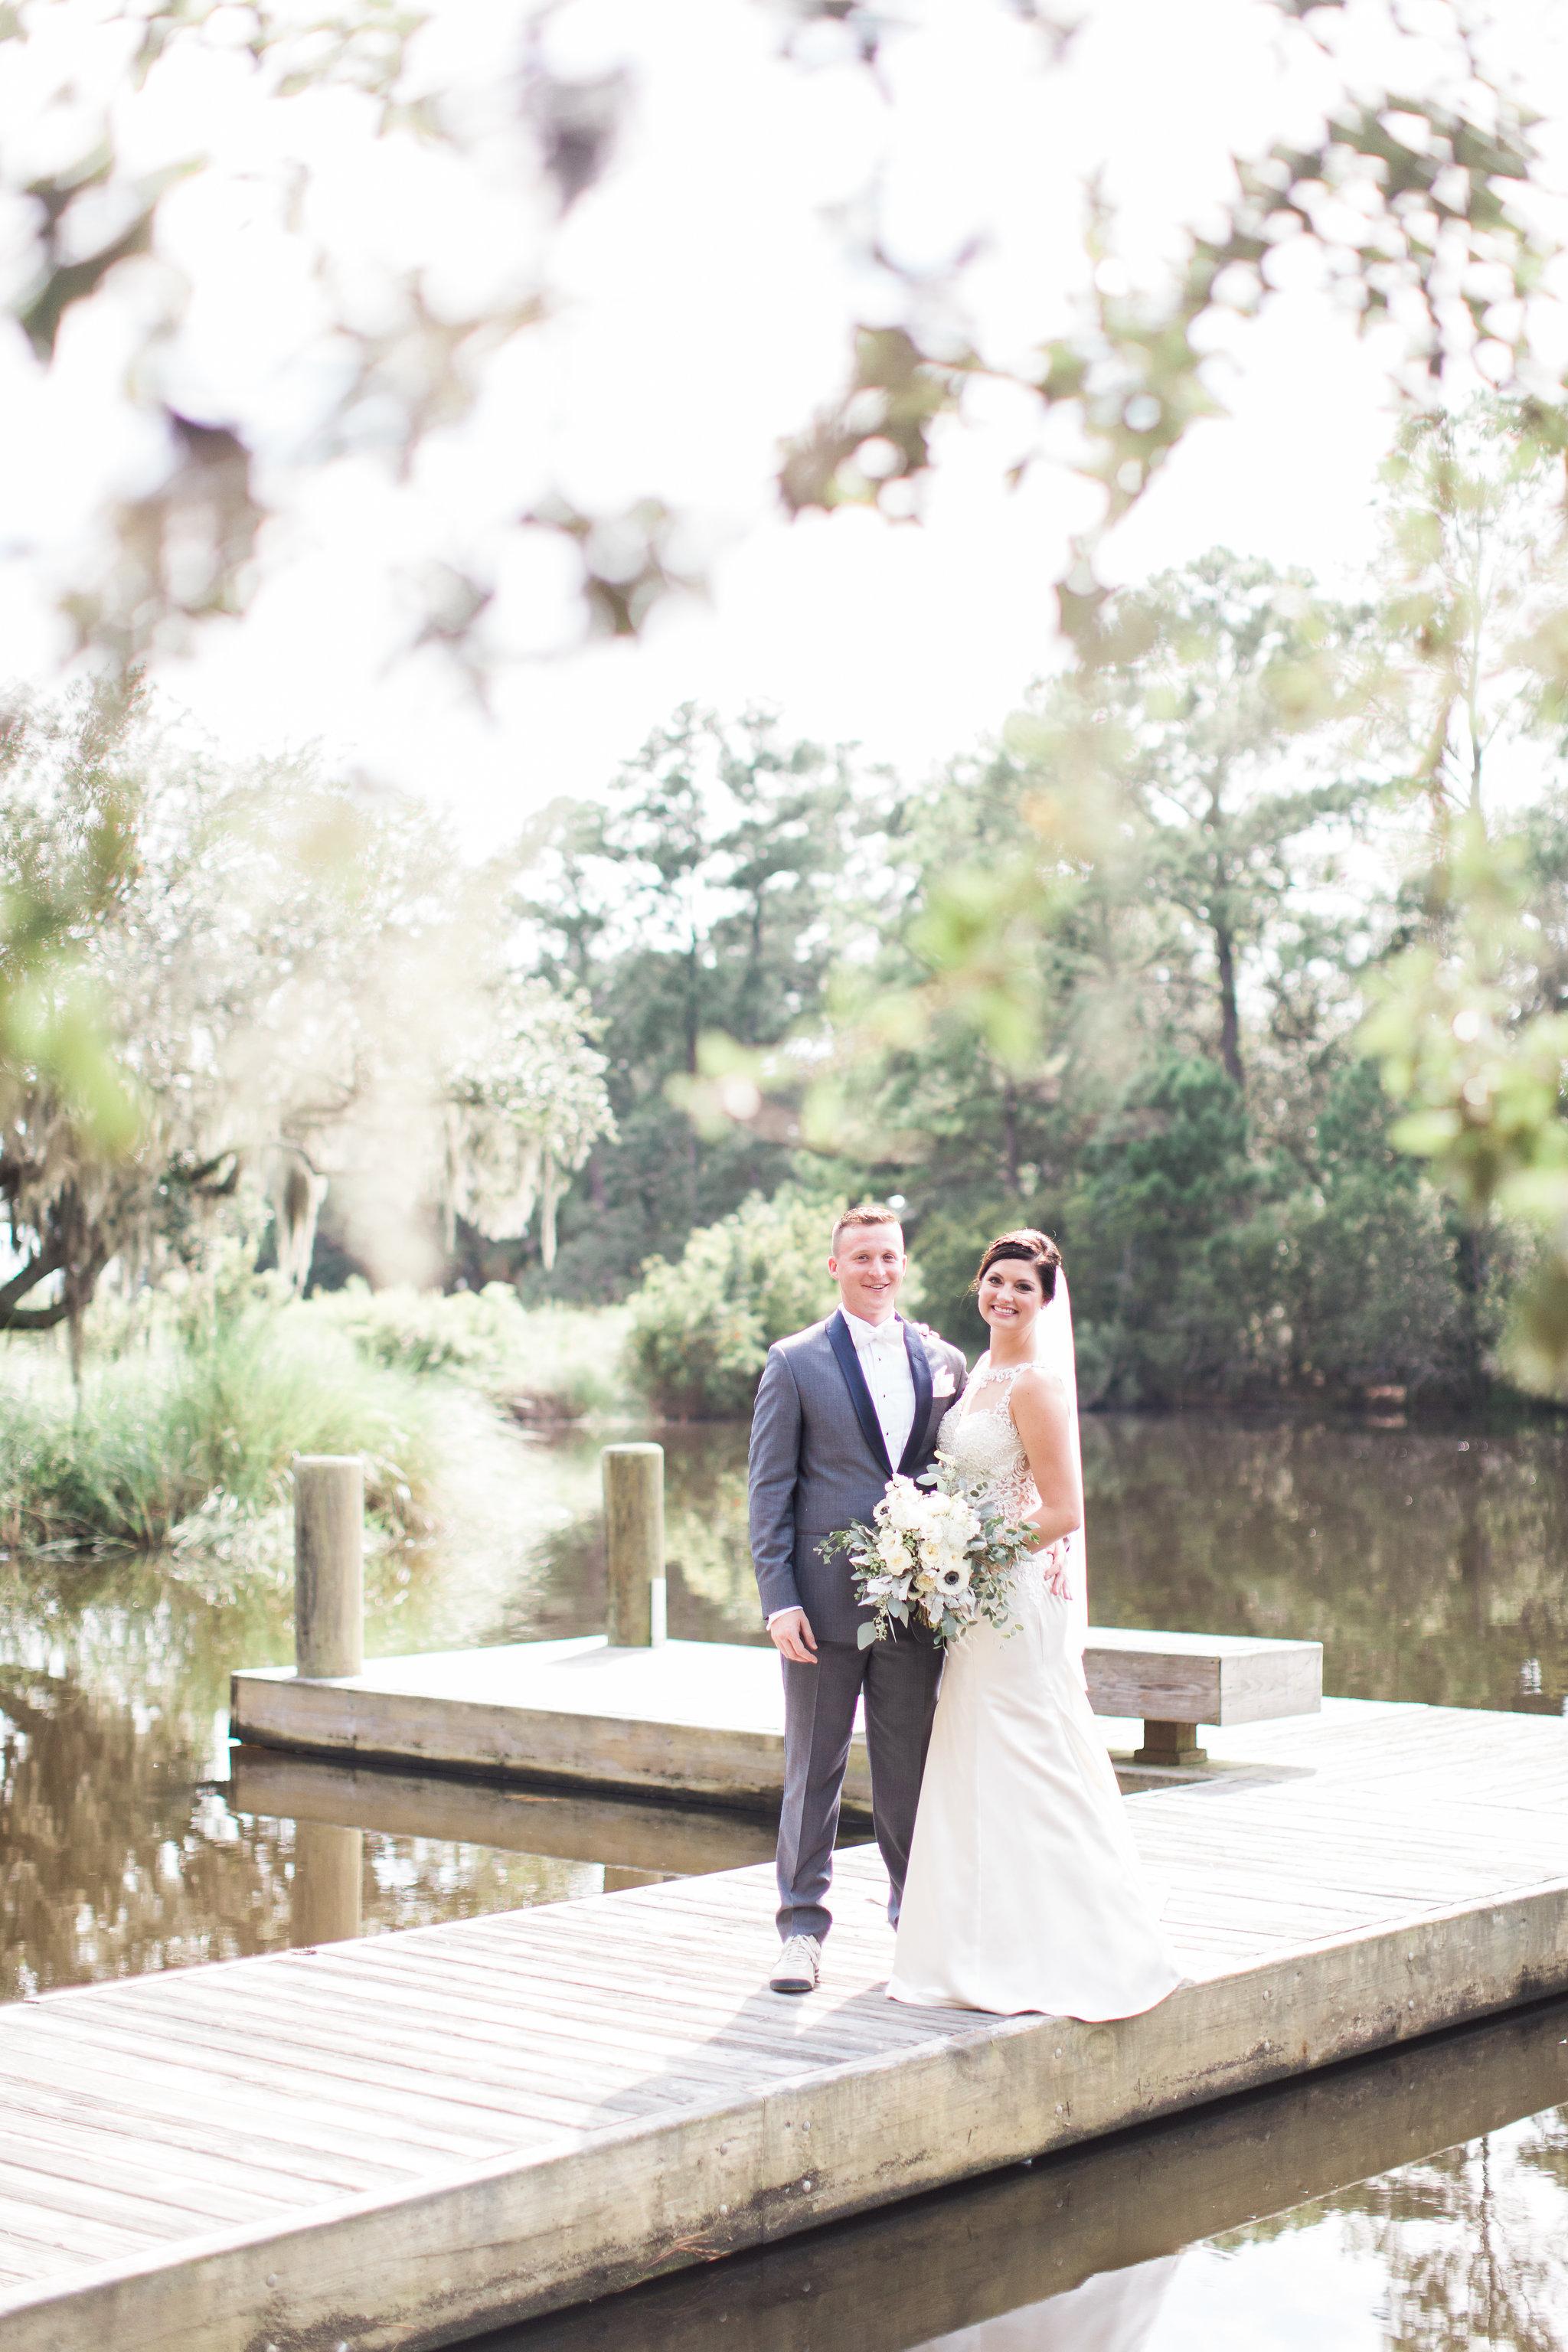 apt-b-photography-lauren-graham-oldfield-wedding-south-carolina-wedding-photographer-savannah-wedding-lowcountry-wedding-coastal-wedding-first-look-14.JPG